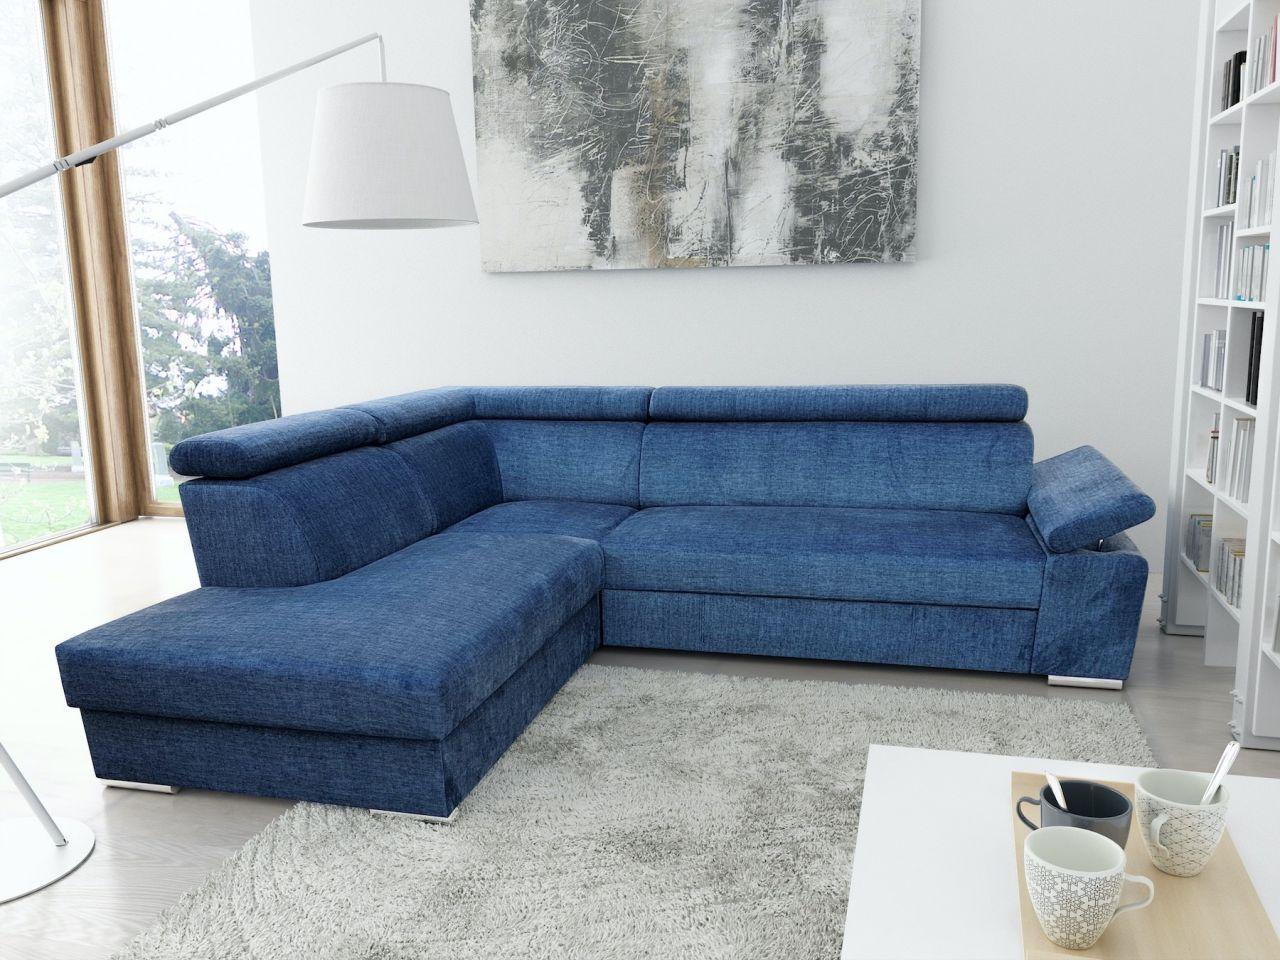 Ecksofa Sofa Libra Mit Schlaffunktion Blau Ottomane Links Kaufen Bei Sylwia Lesniewska Fun Mobel